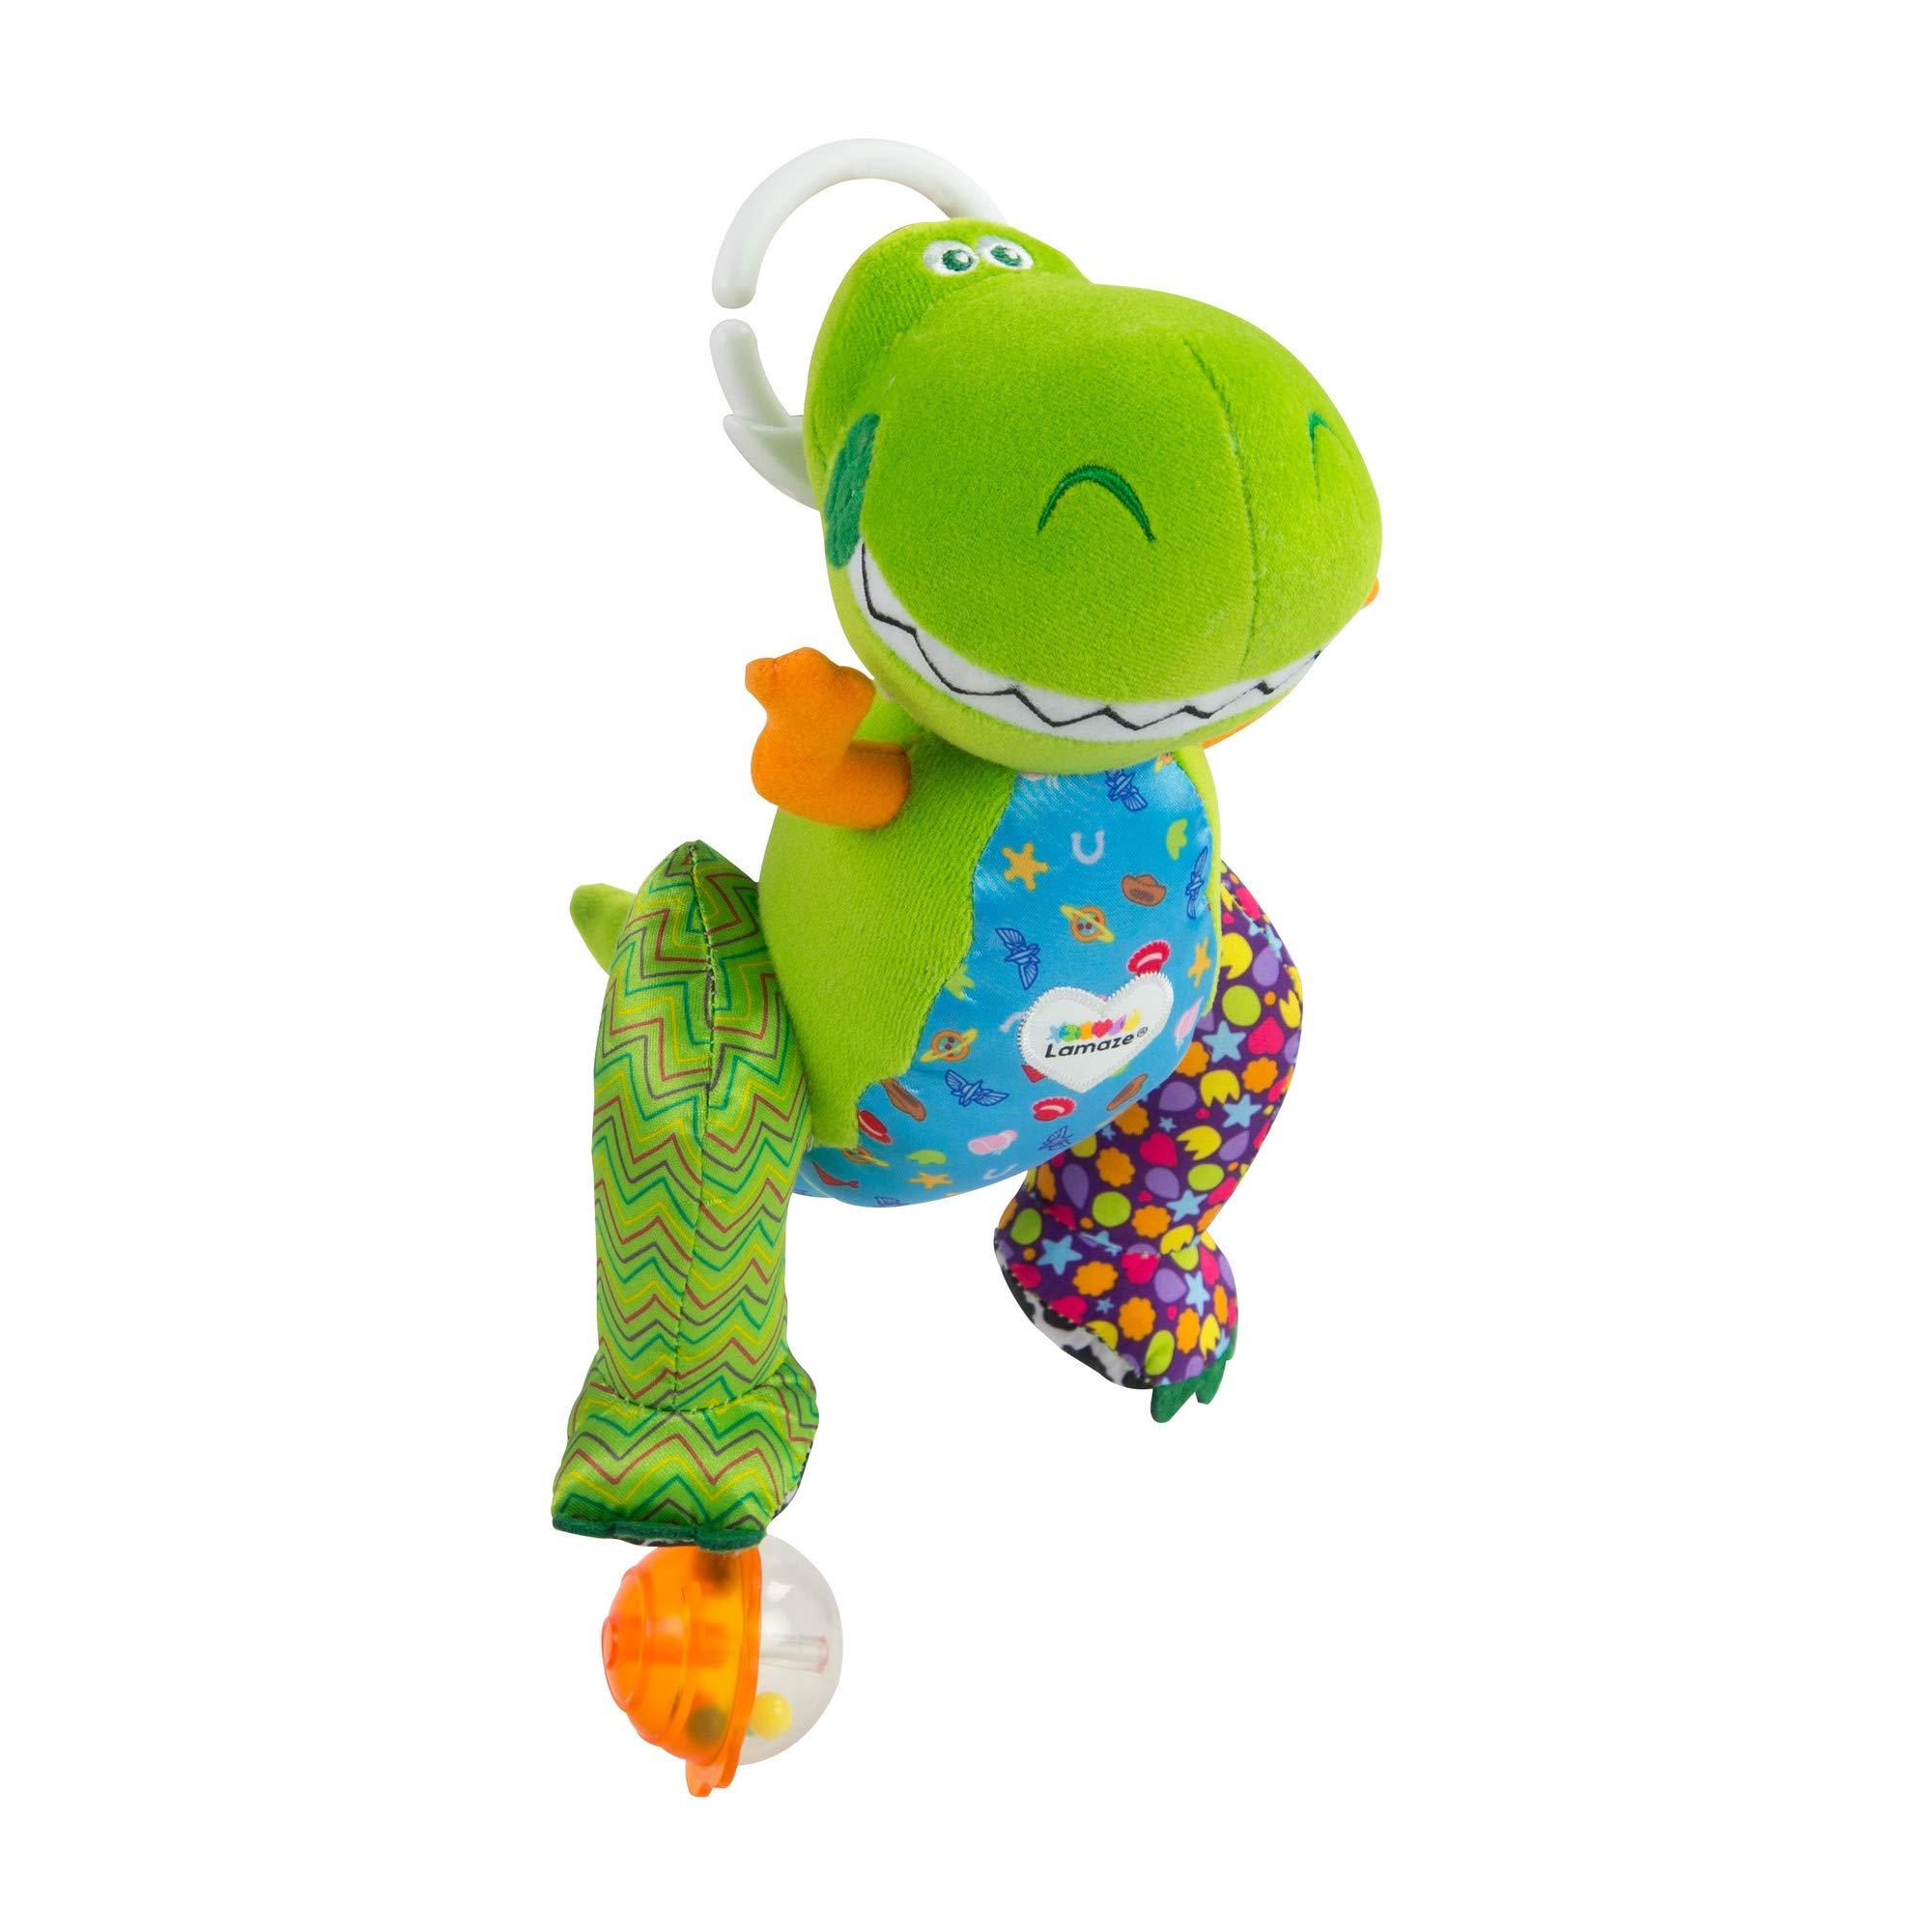 Lamaze Disney/Pixar Toy Story Clip & Go Rex Stroller Toy by LAMAZE